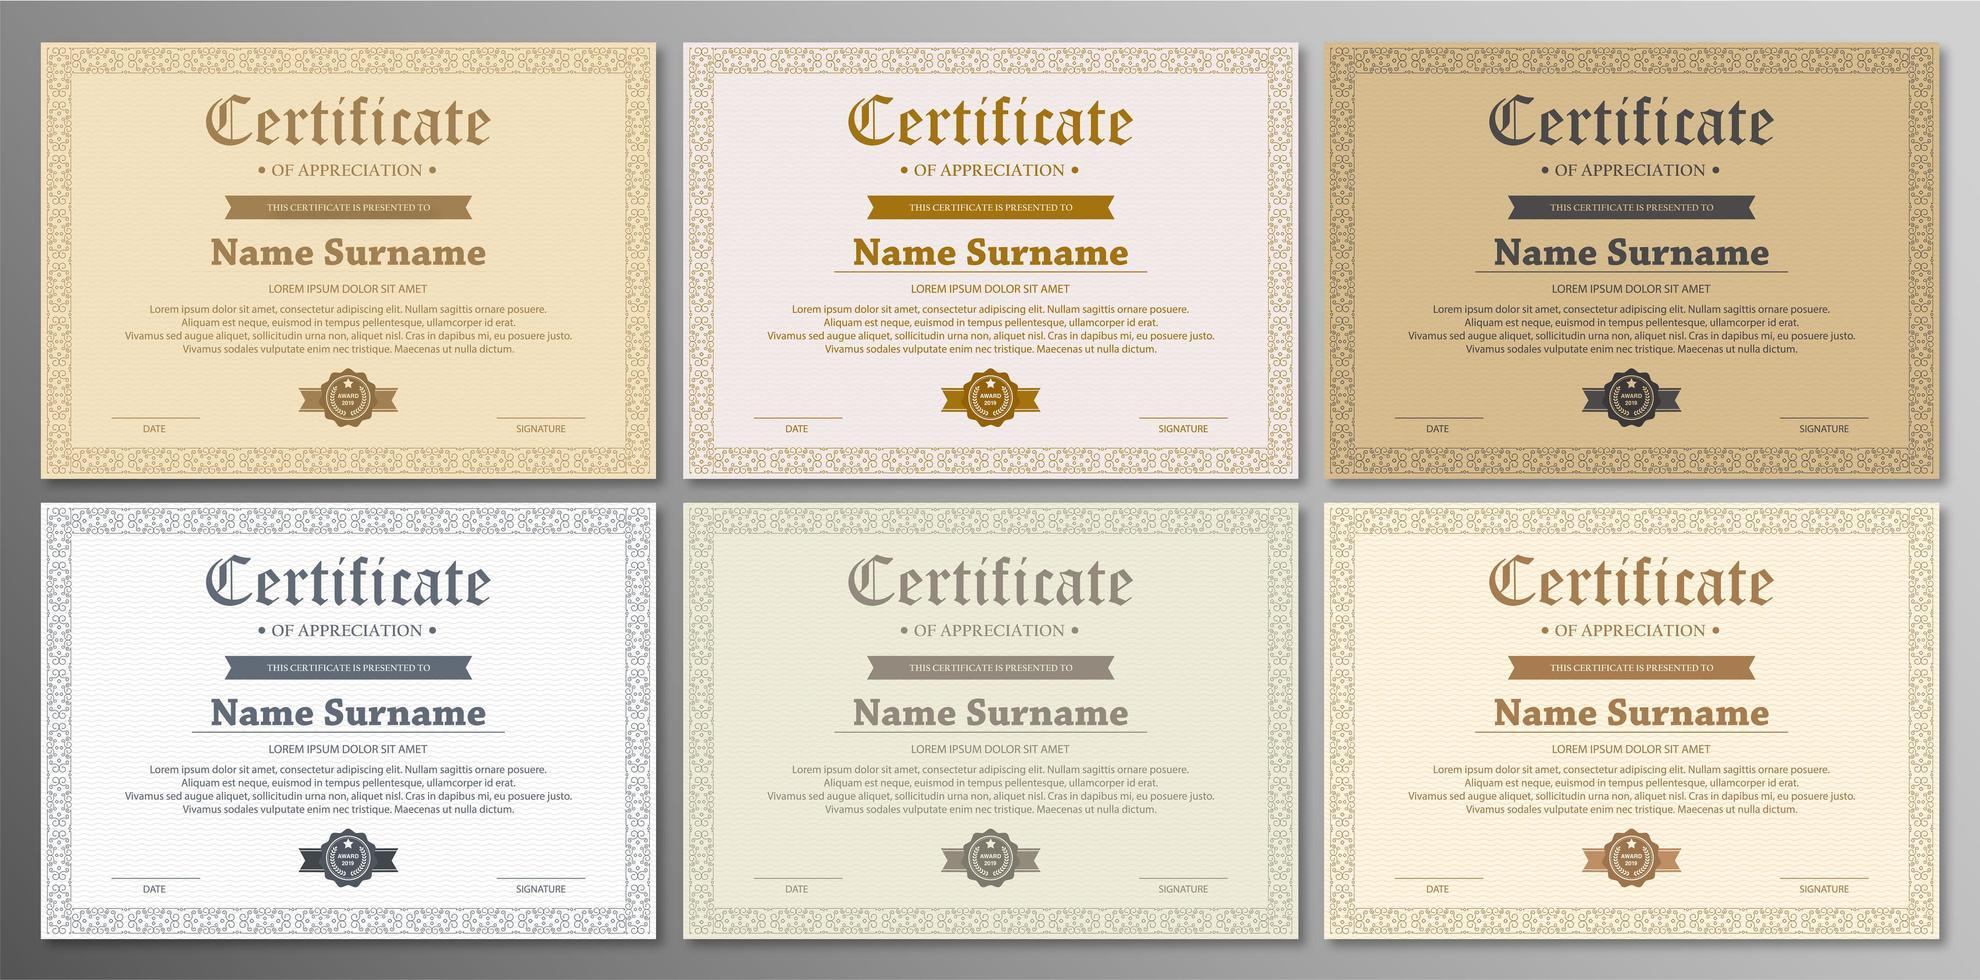 Zertifikatvorlagensatz vektor